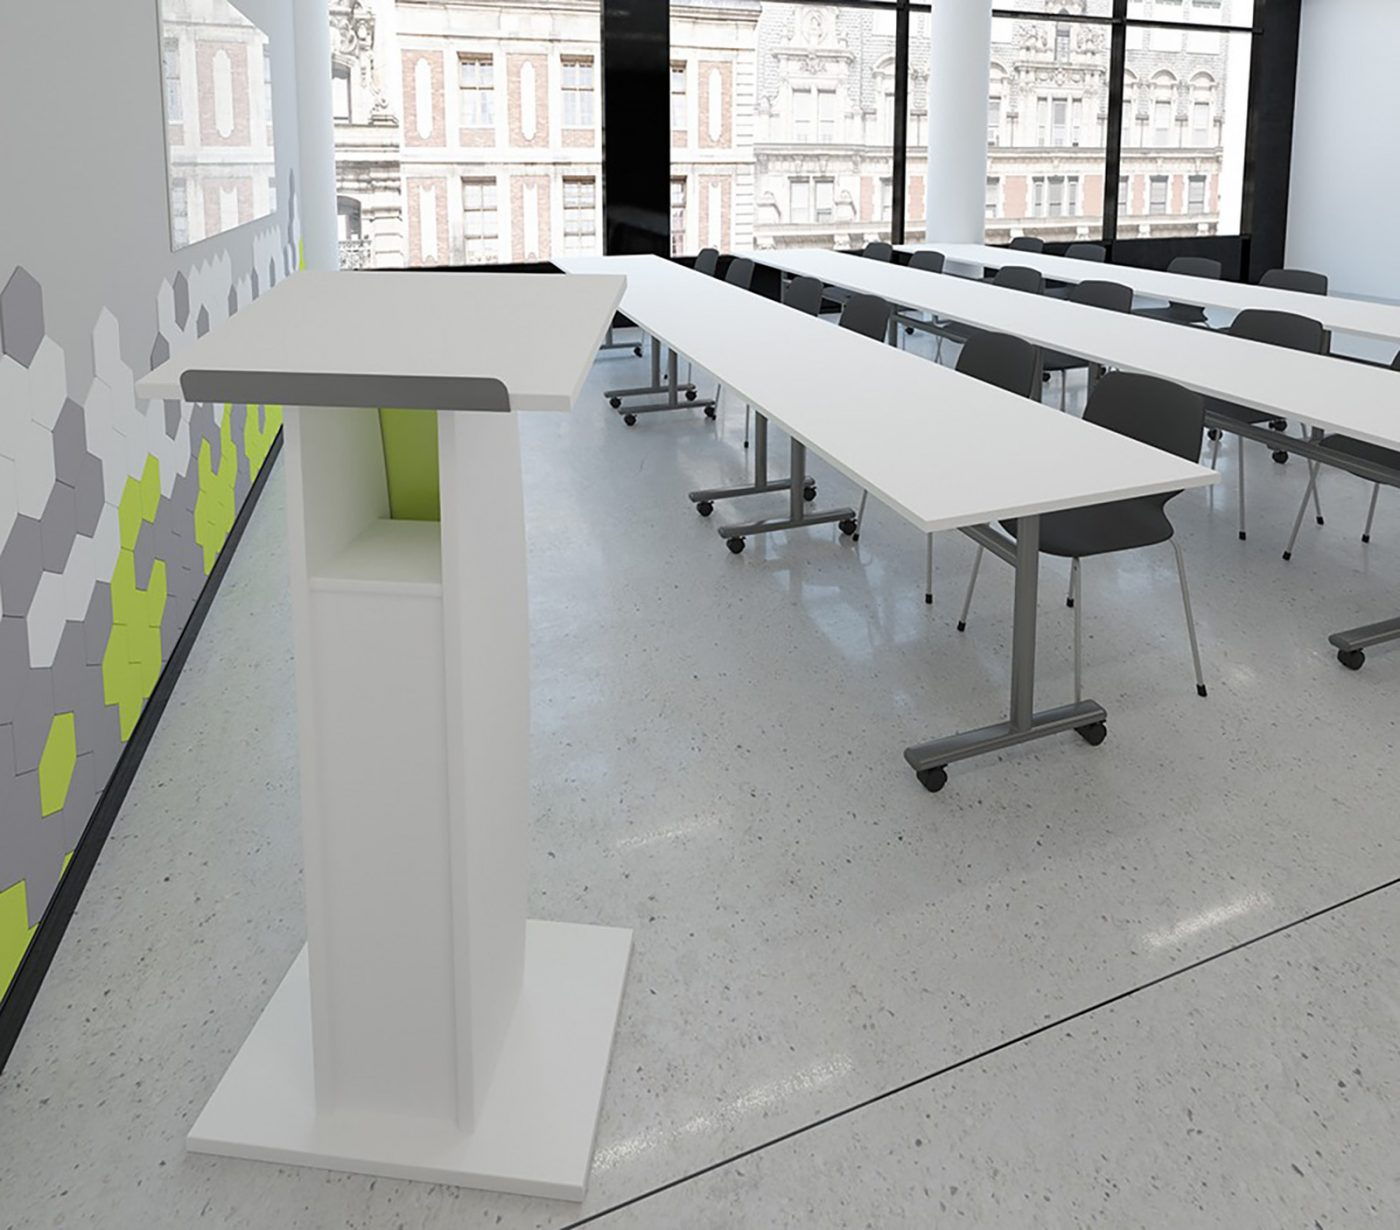 lectern, classroom furniture, university furniture